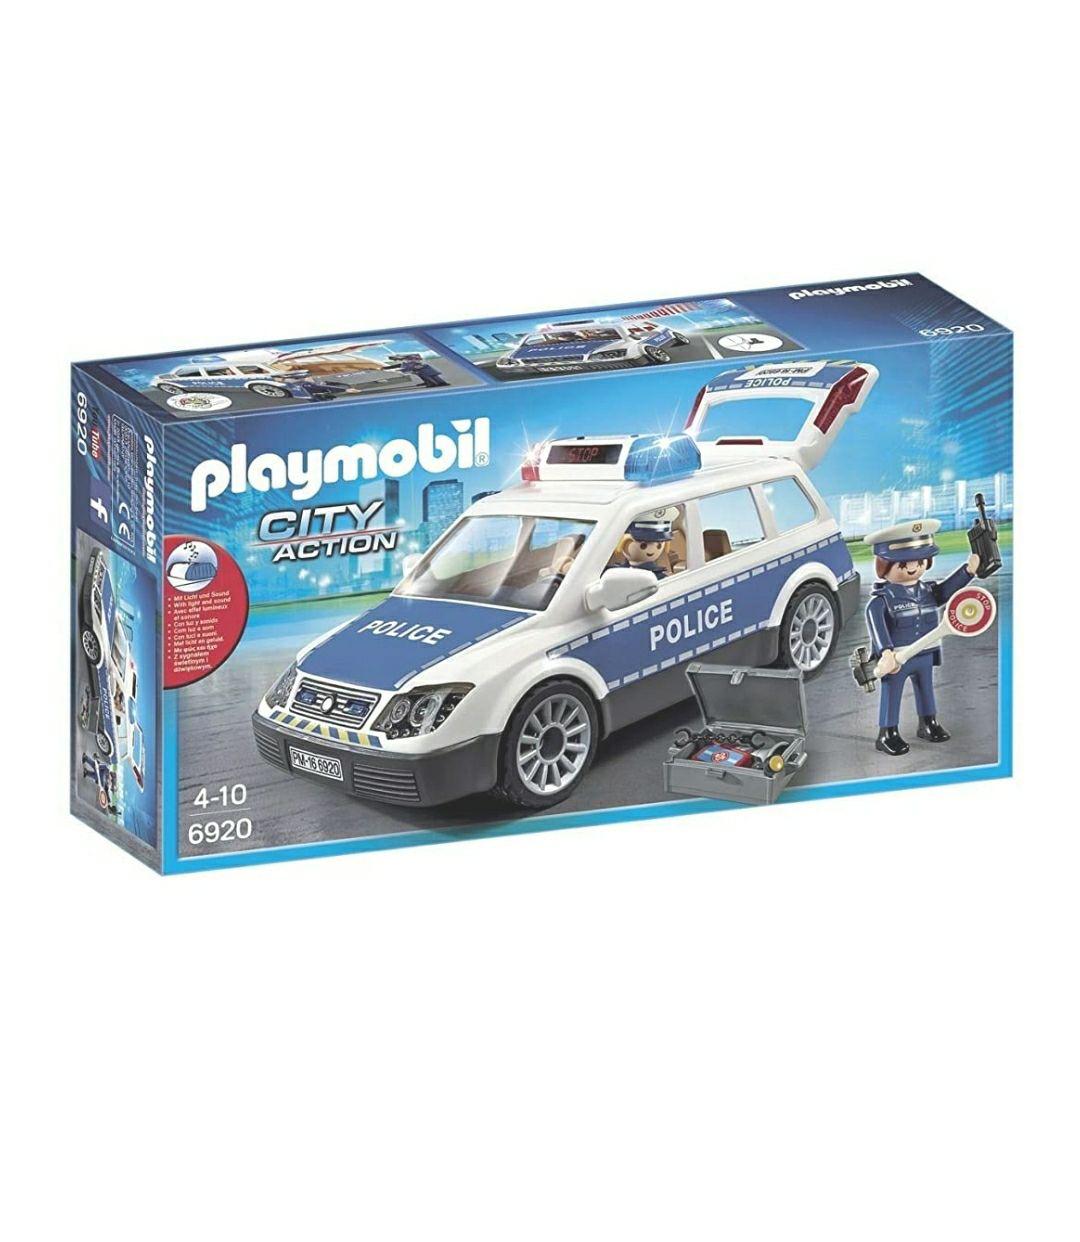 Playmobil City action police car 6920 £14.79 Prime at Amazon (+£4.49 non Prime)